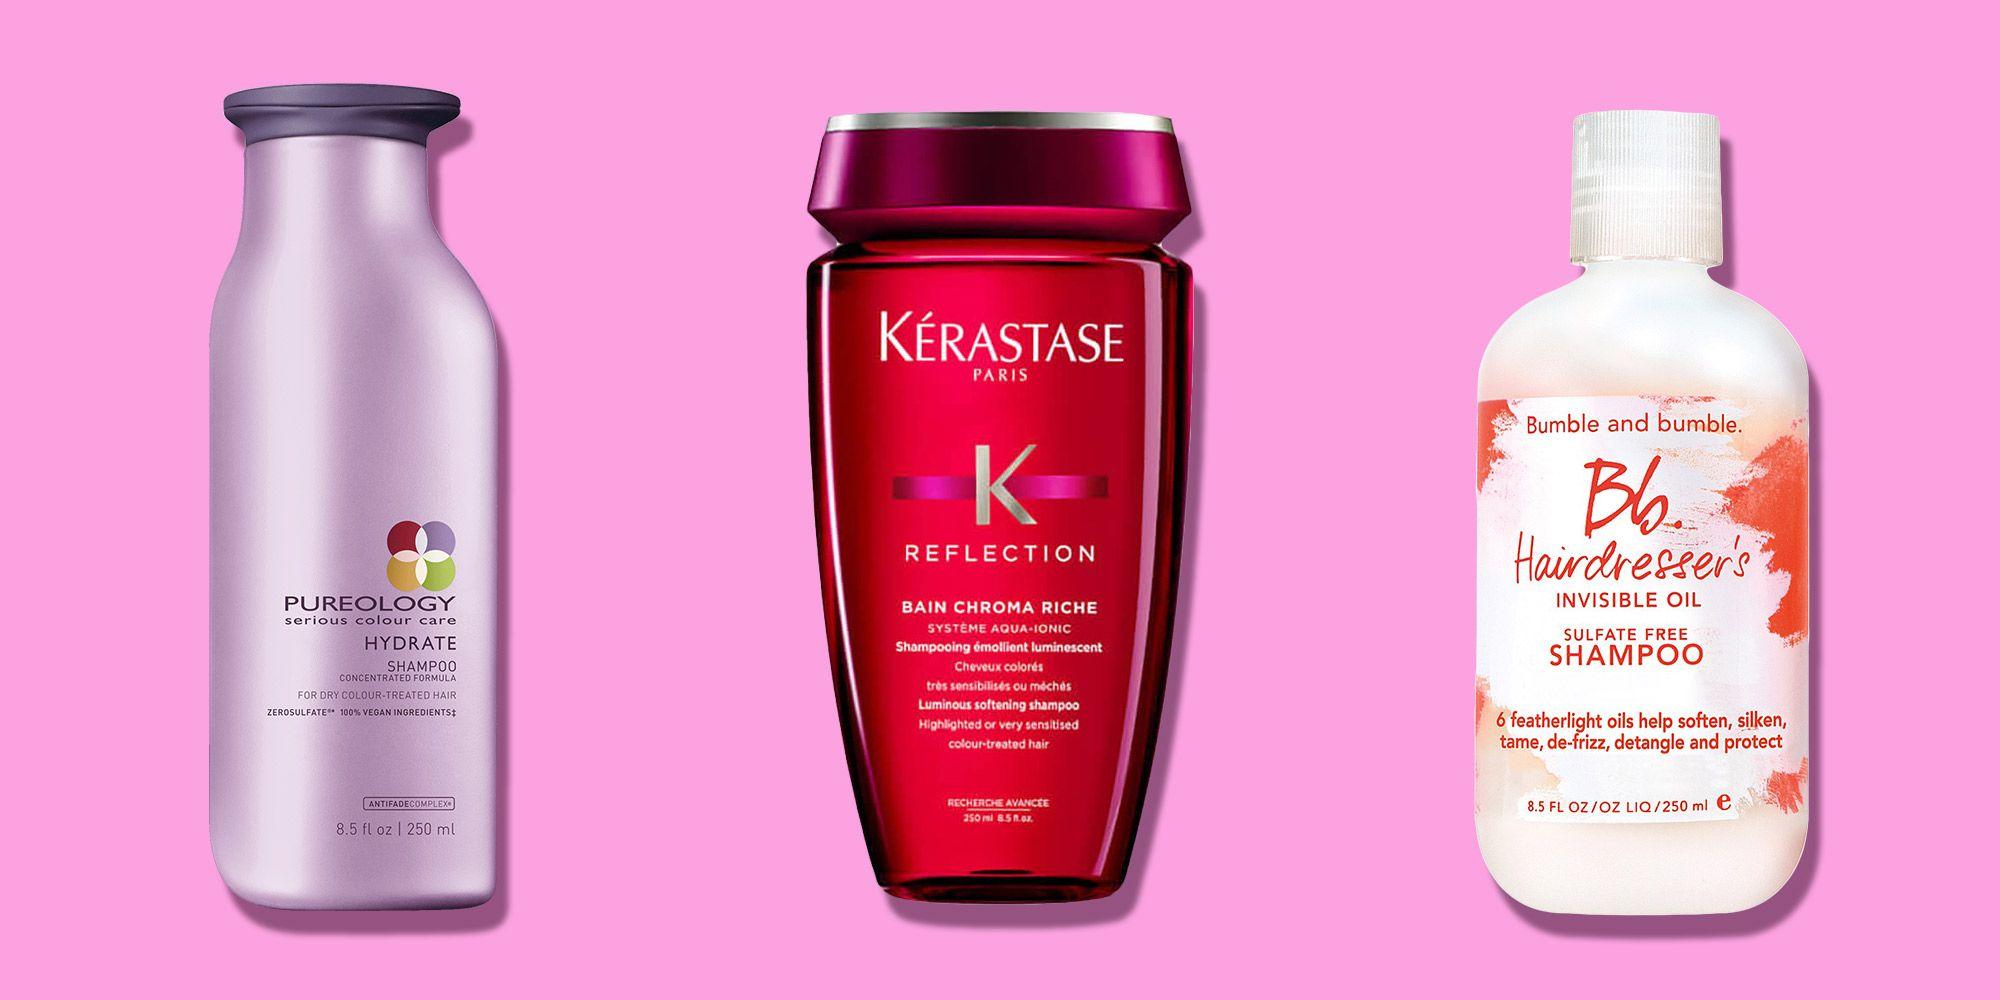 12 best sulfate free shampoos of 2017 natural non toxic shampoo pmusecretfo Choice Image